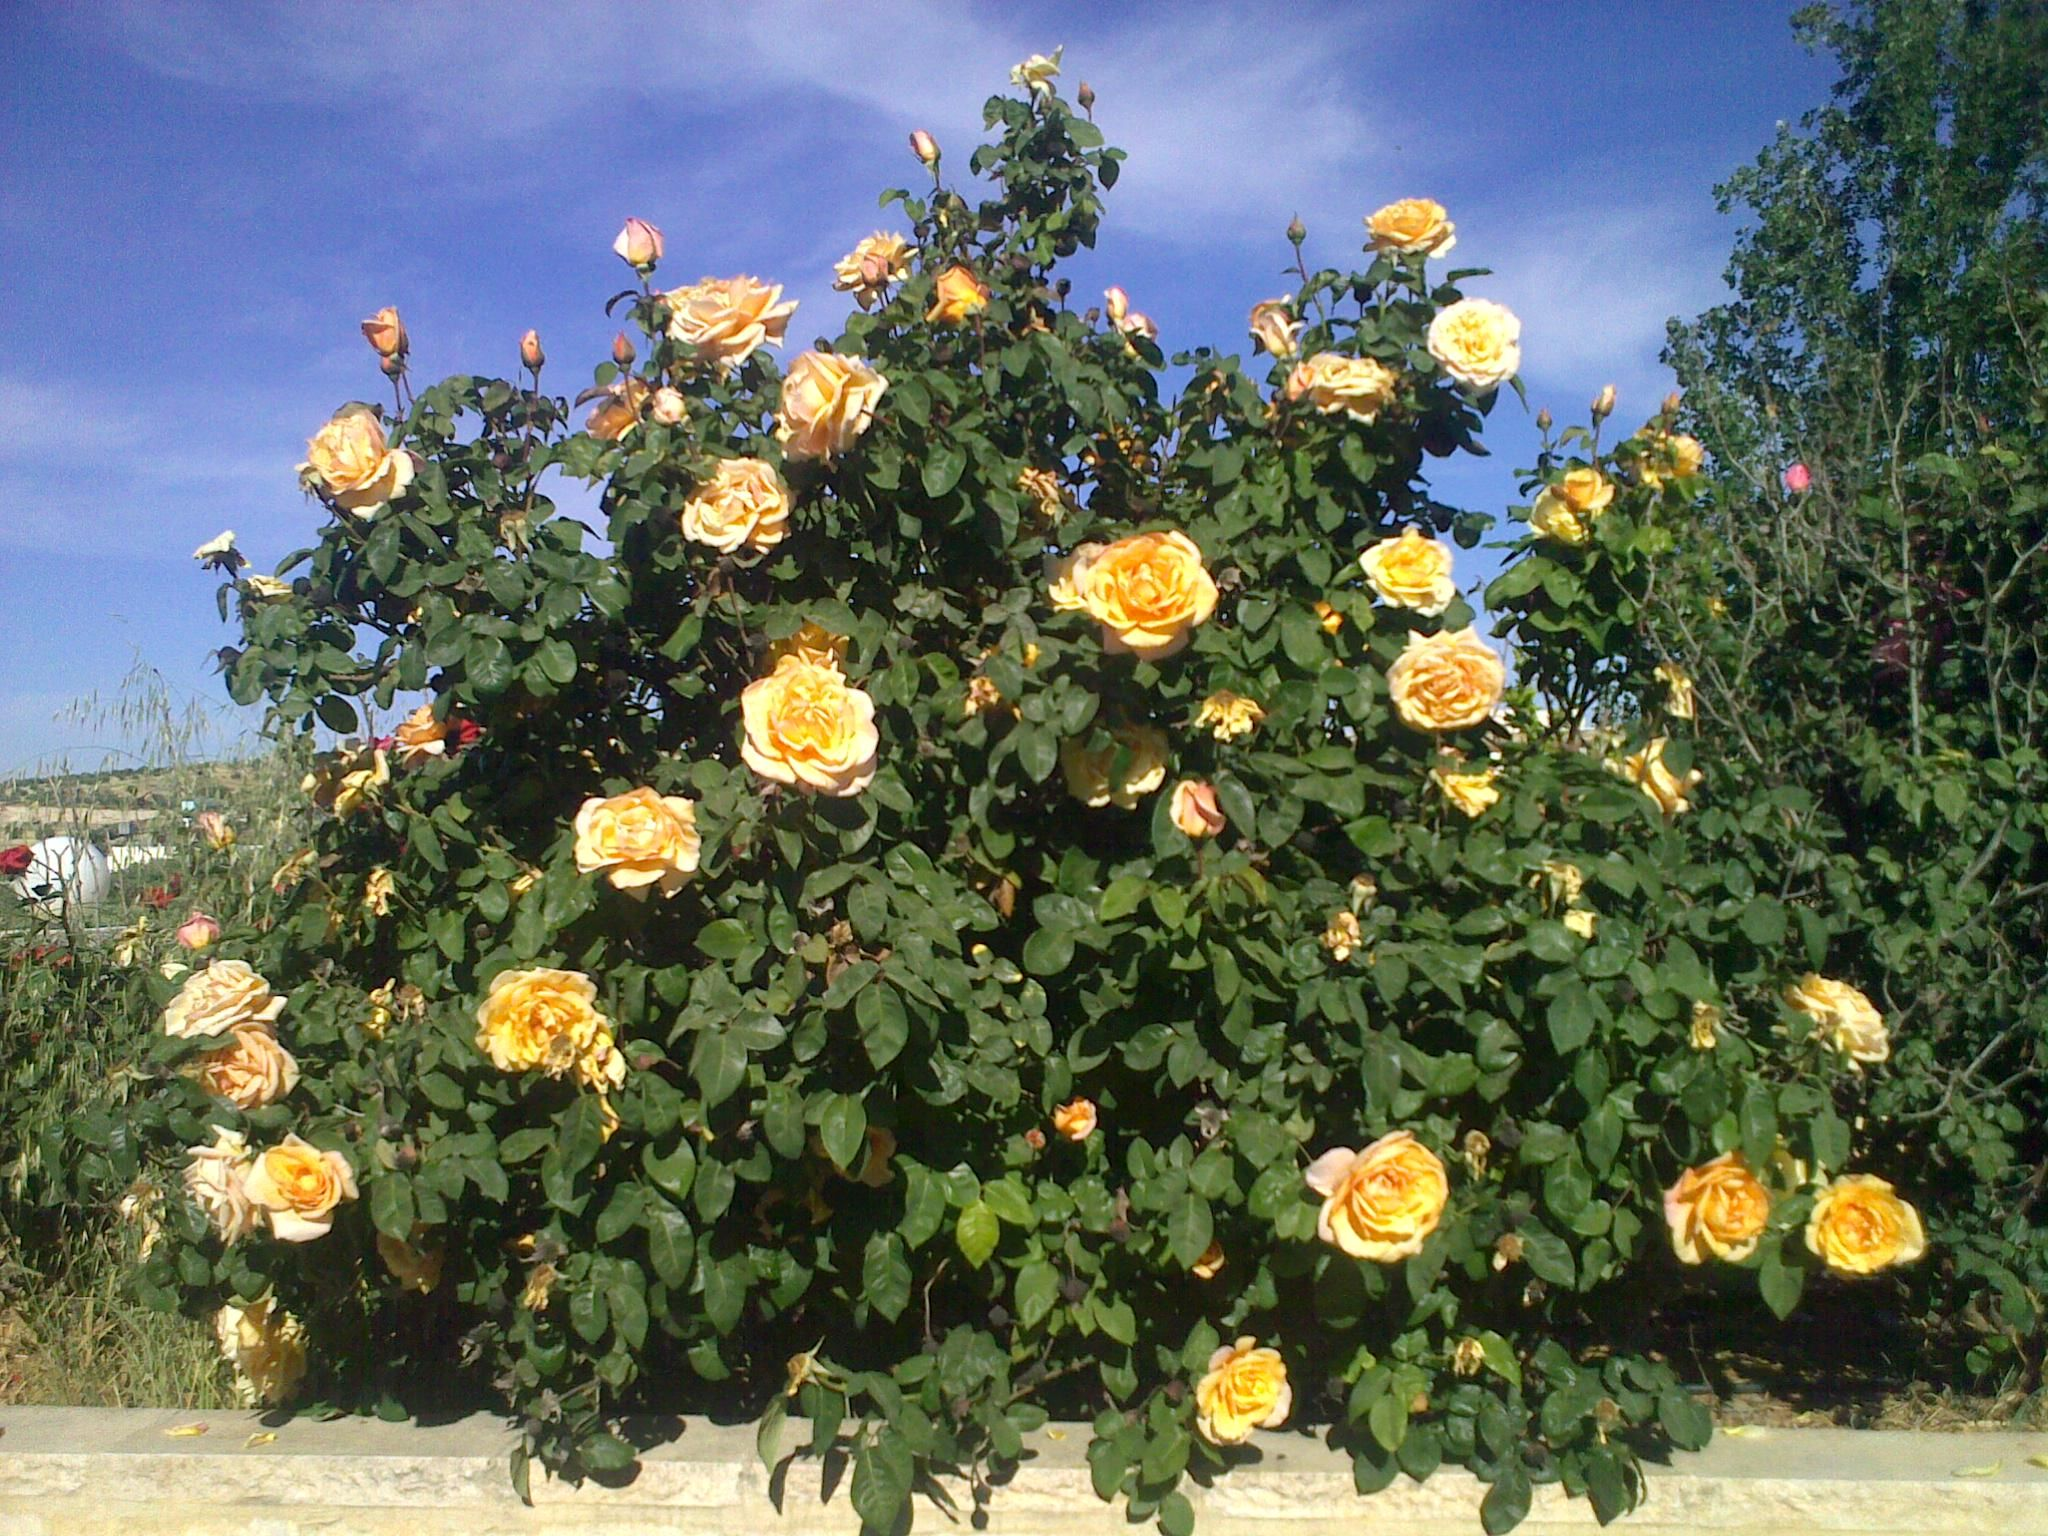 Yellow Rose Bush Rose Garden Landscape Rose Bush Yellow Roses